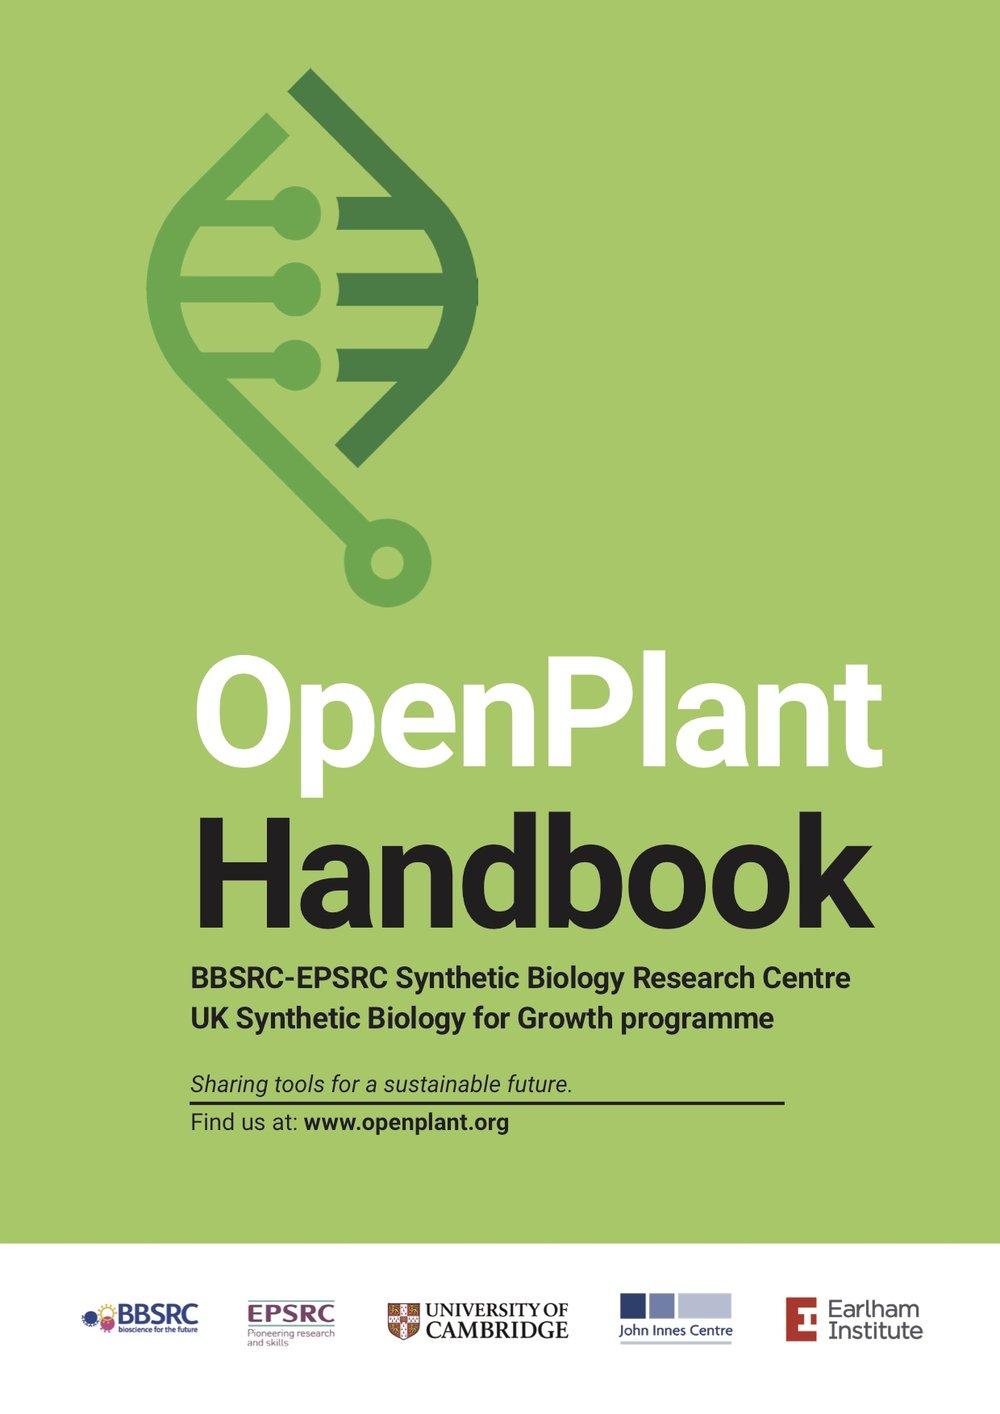 OpenPlant Handbook 2018